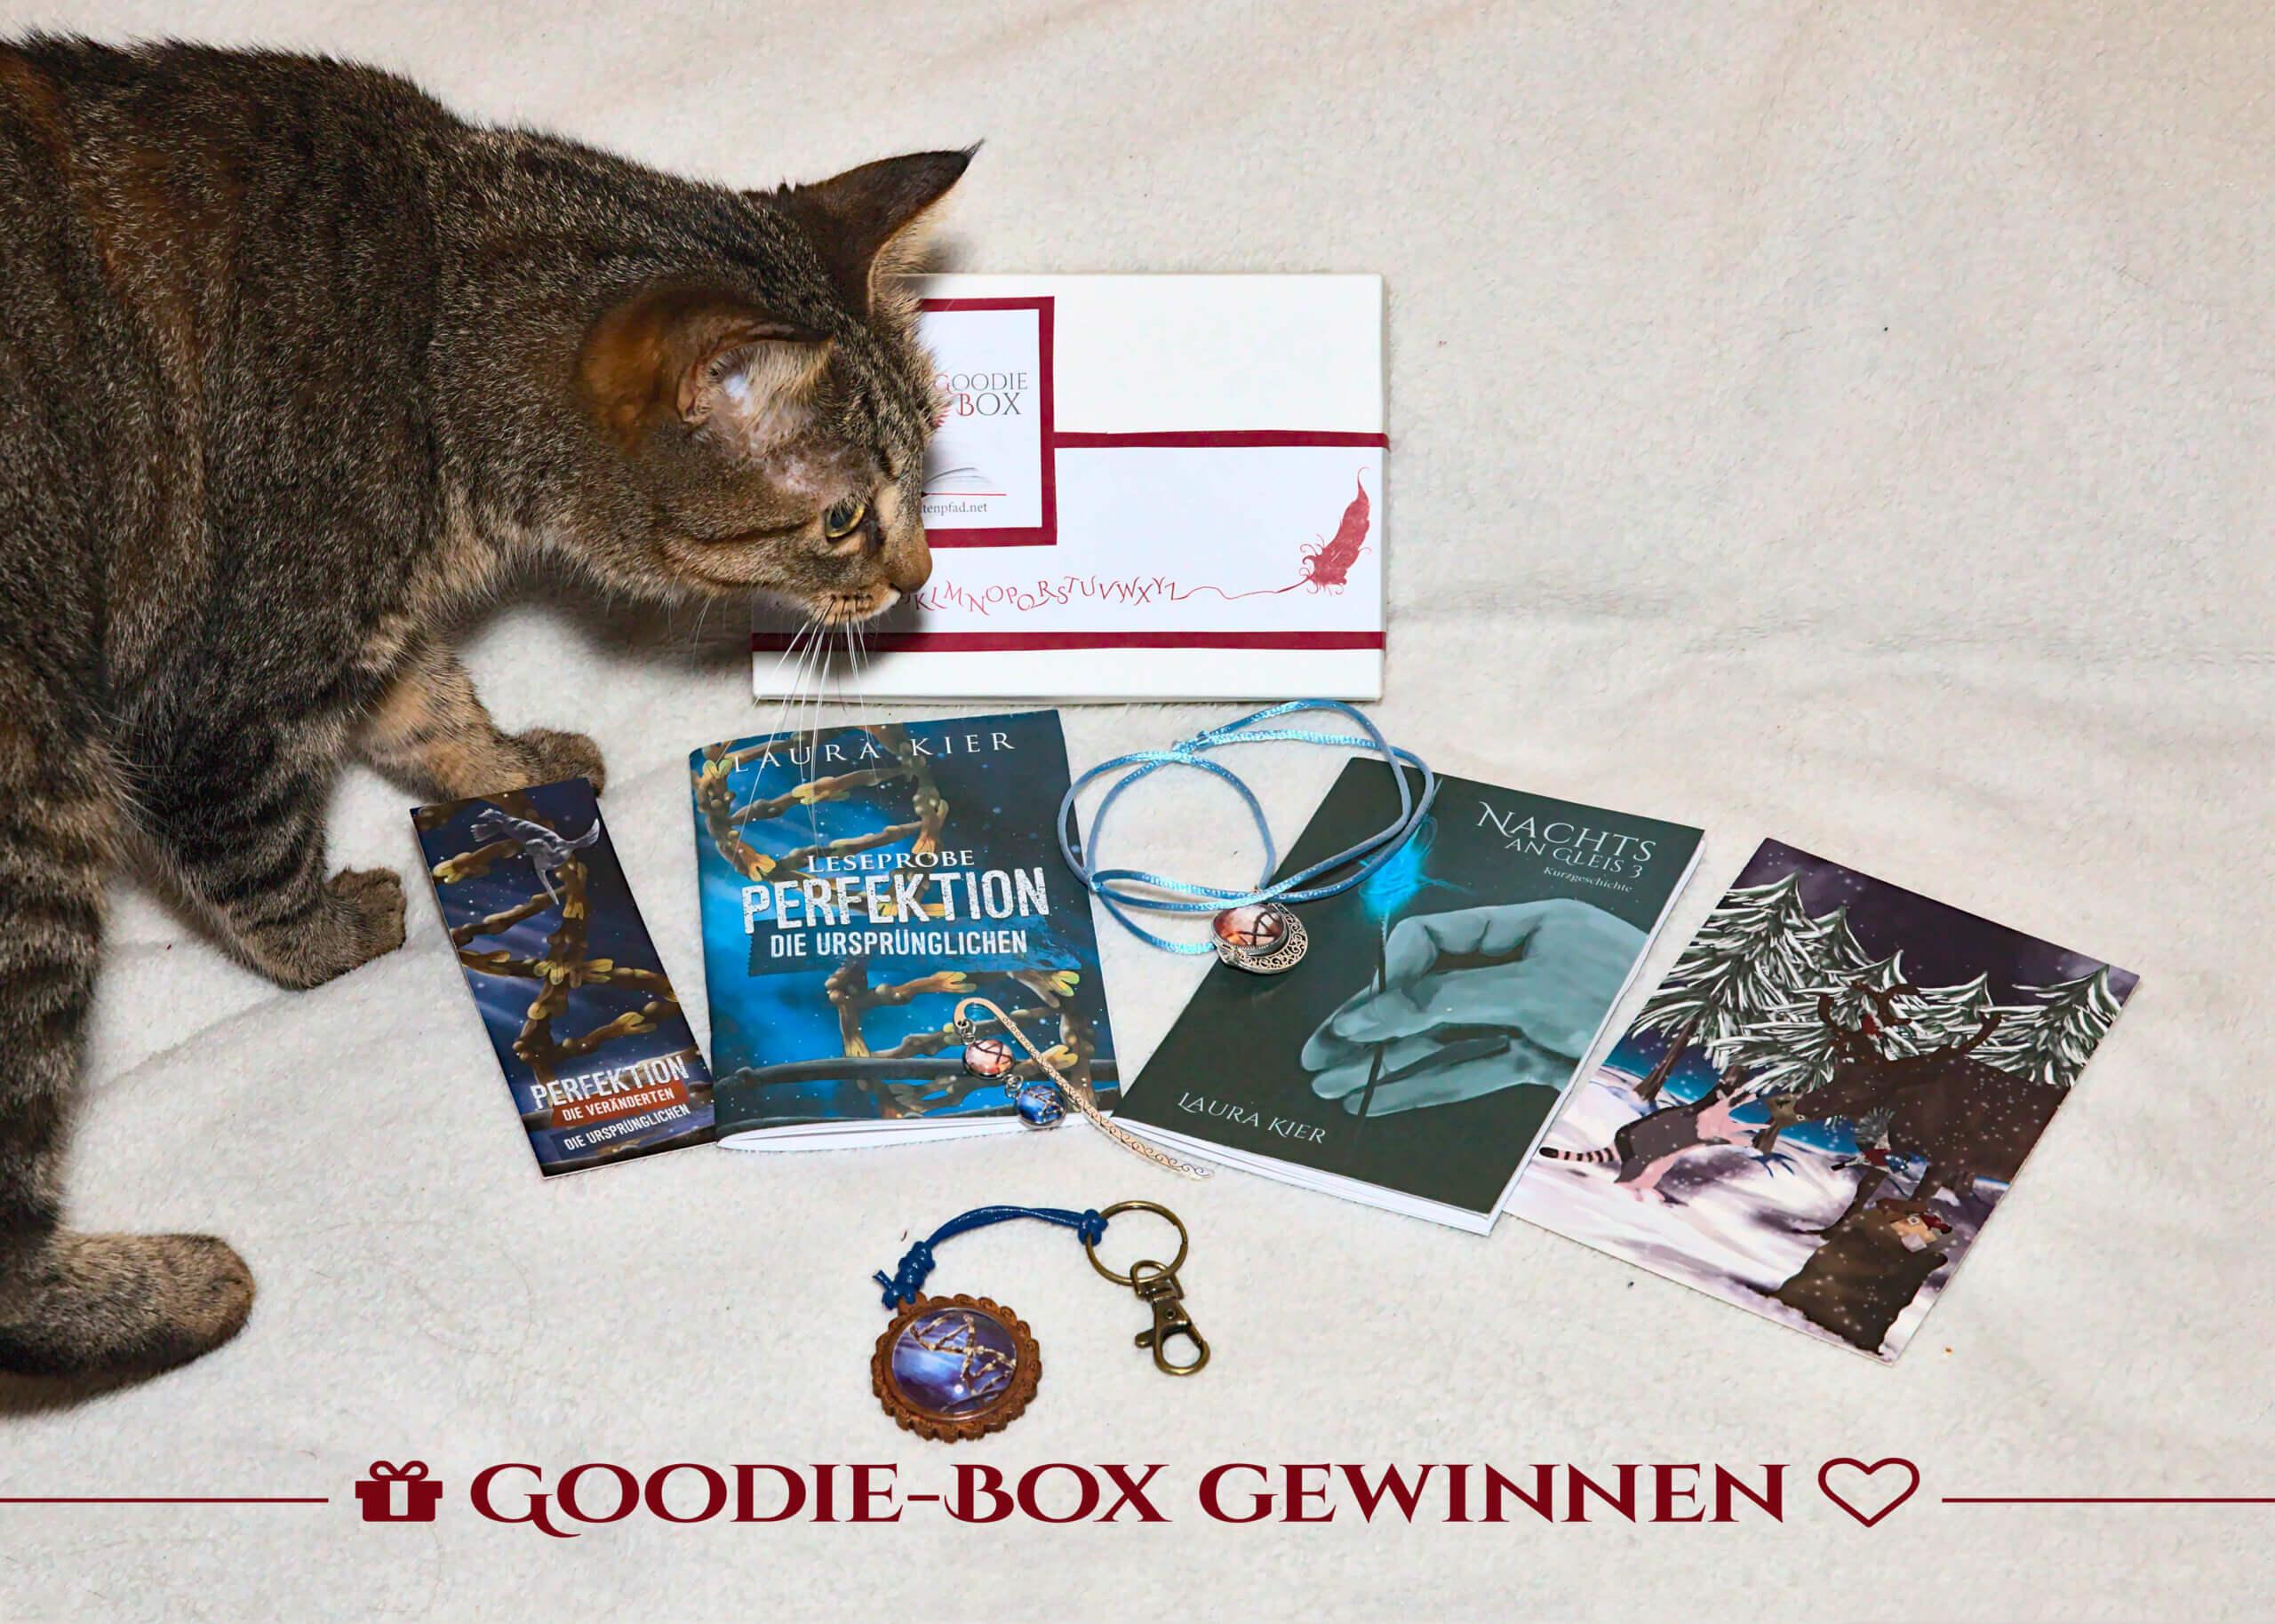 Perfektion-Goodie-Box gewinnen